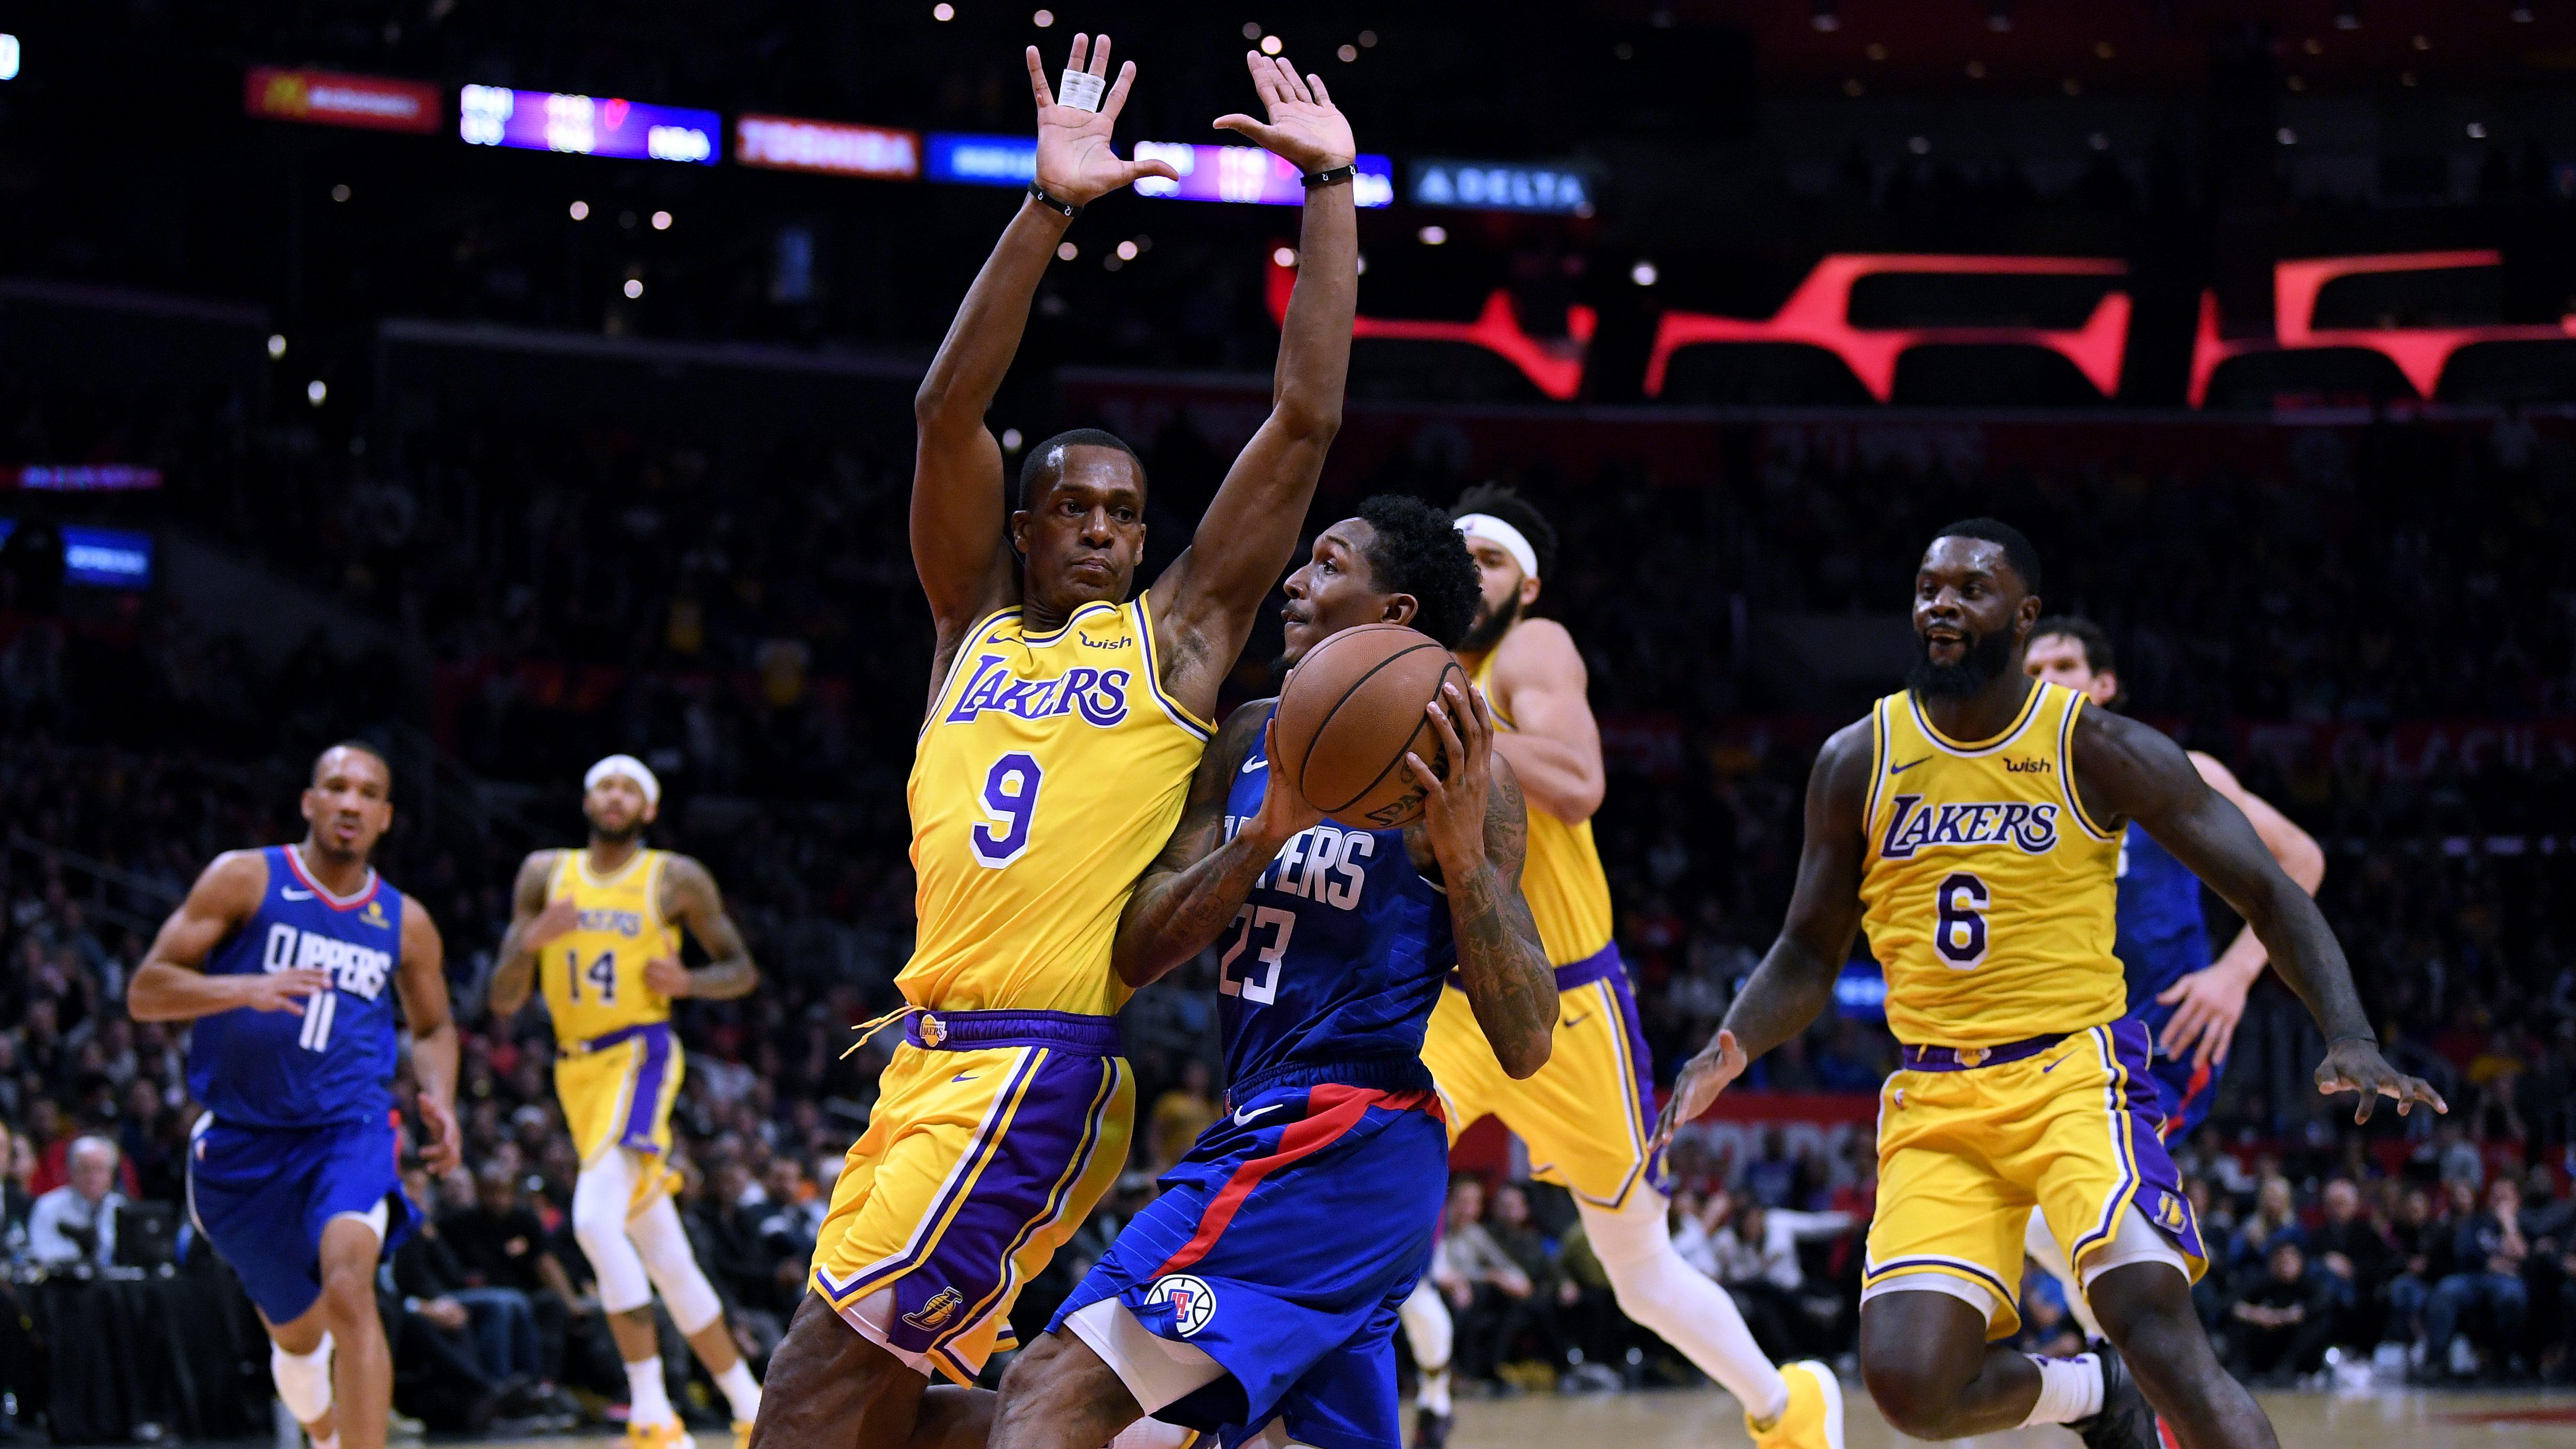 Lakers vs clippers betting line hitesh tewari bitcoins